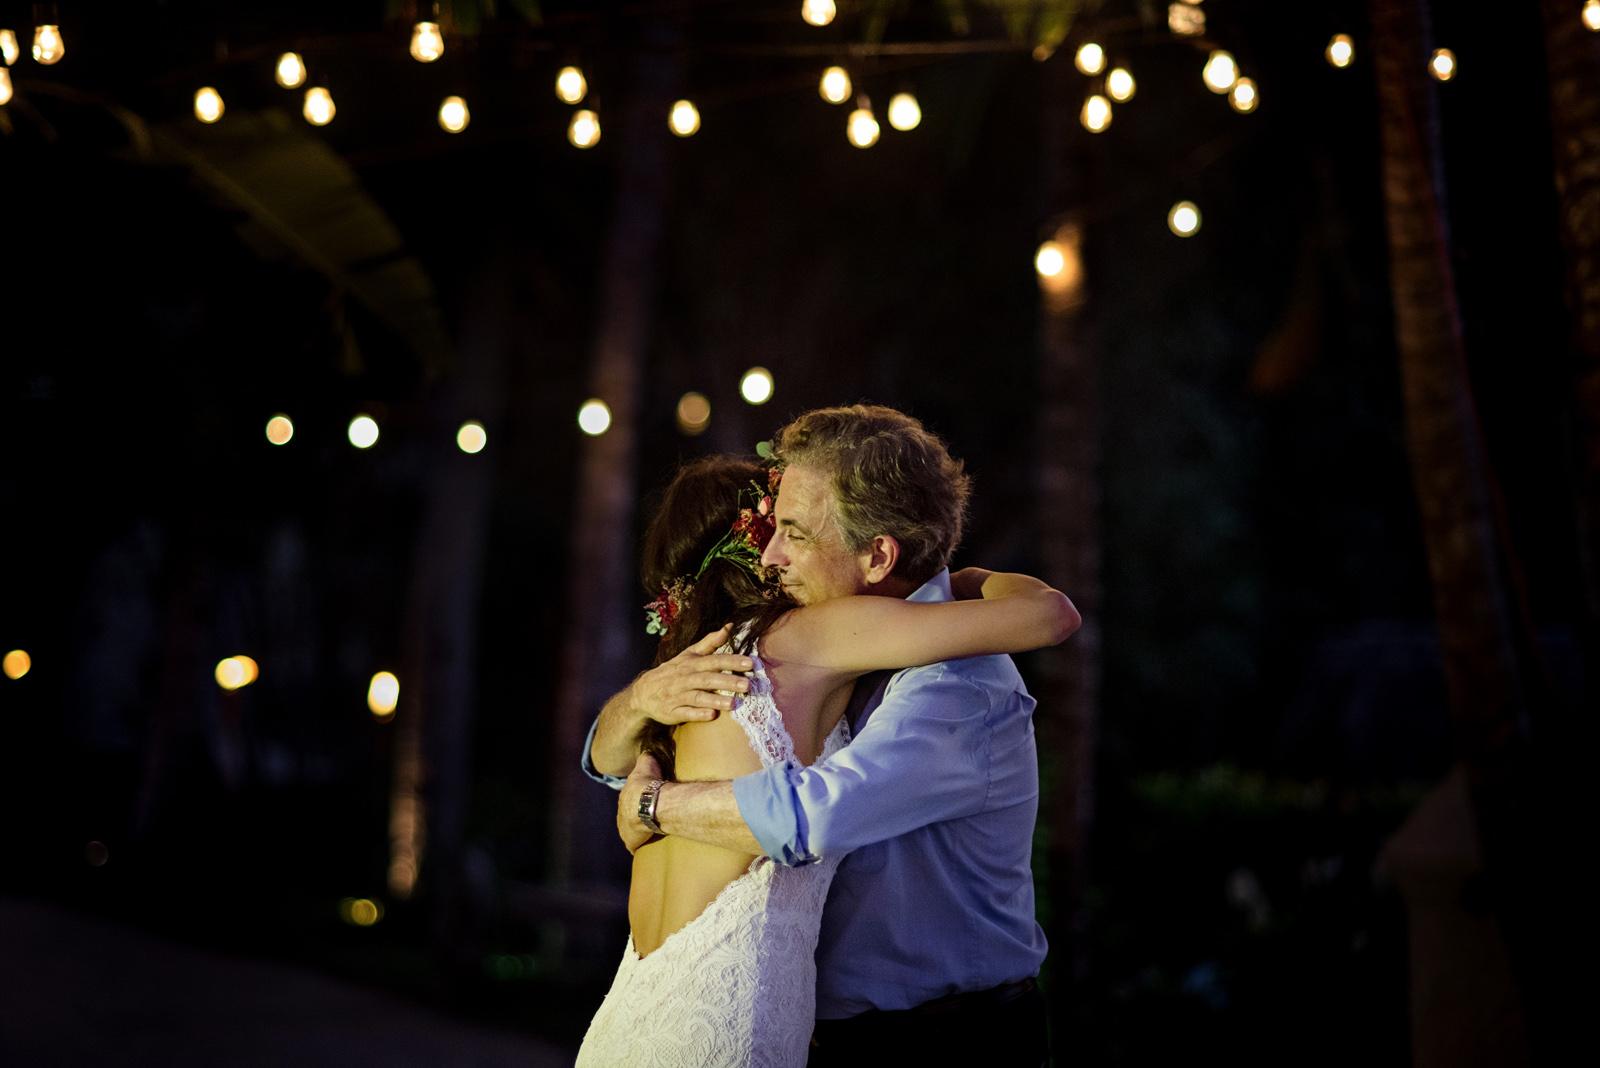 Villa-amor-sayulita-destination-wedding-mexico-082